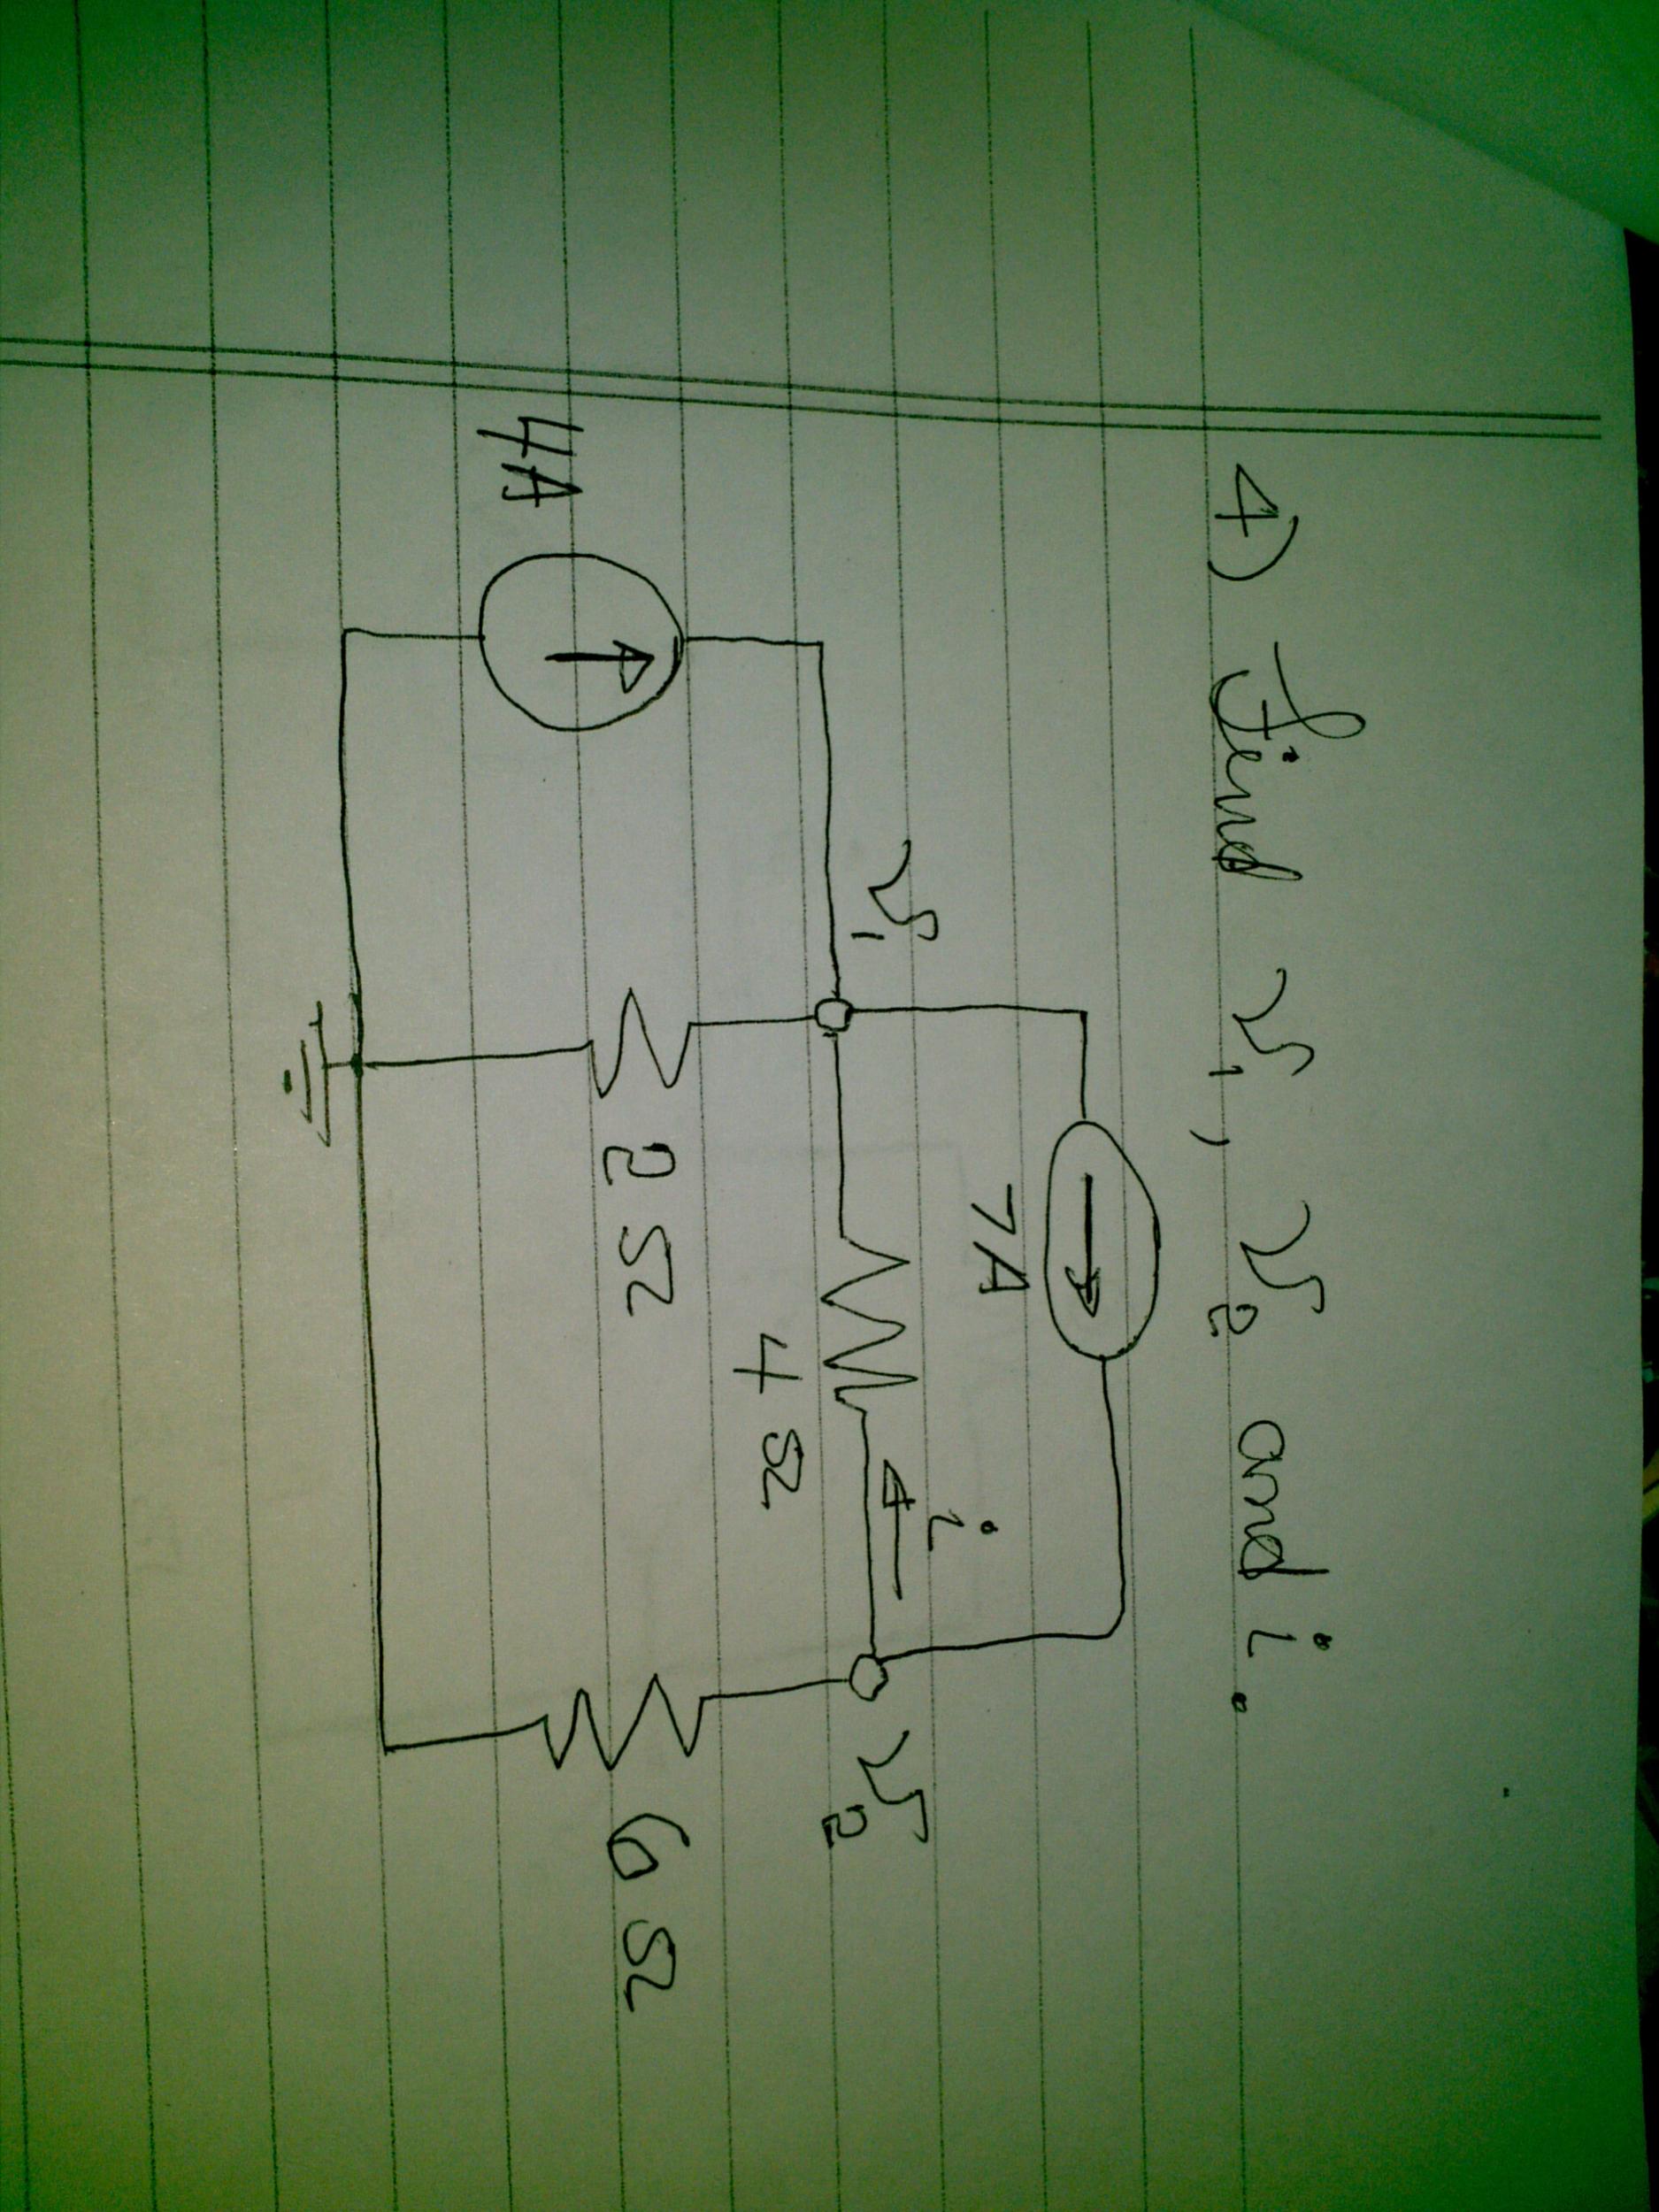 media/3f4/3f49ba22-e4e2-4298-b974-e1